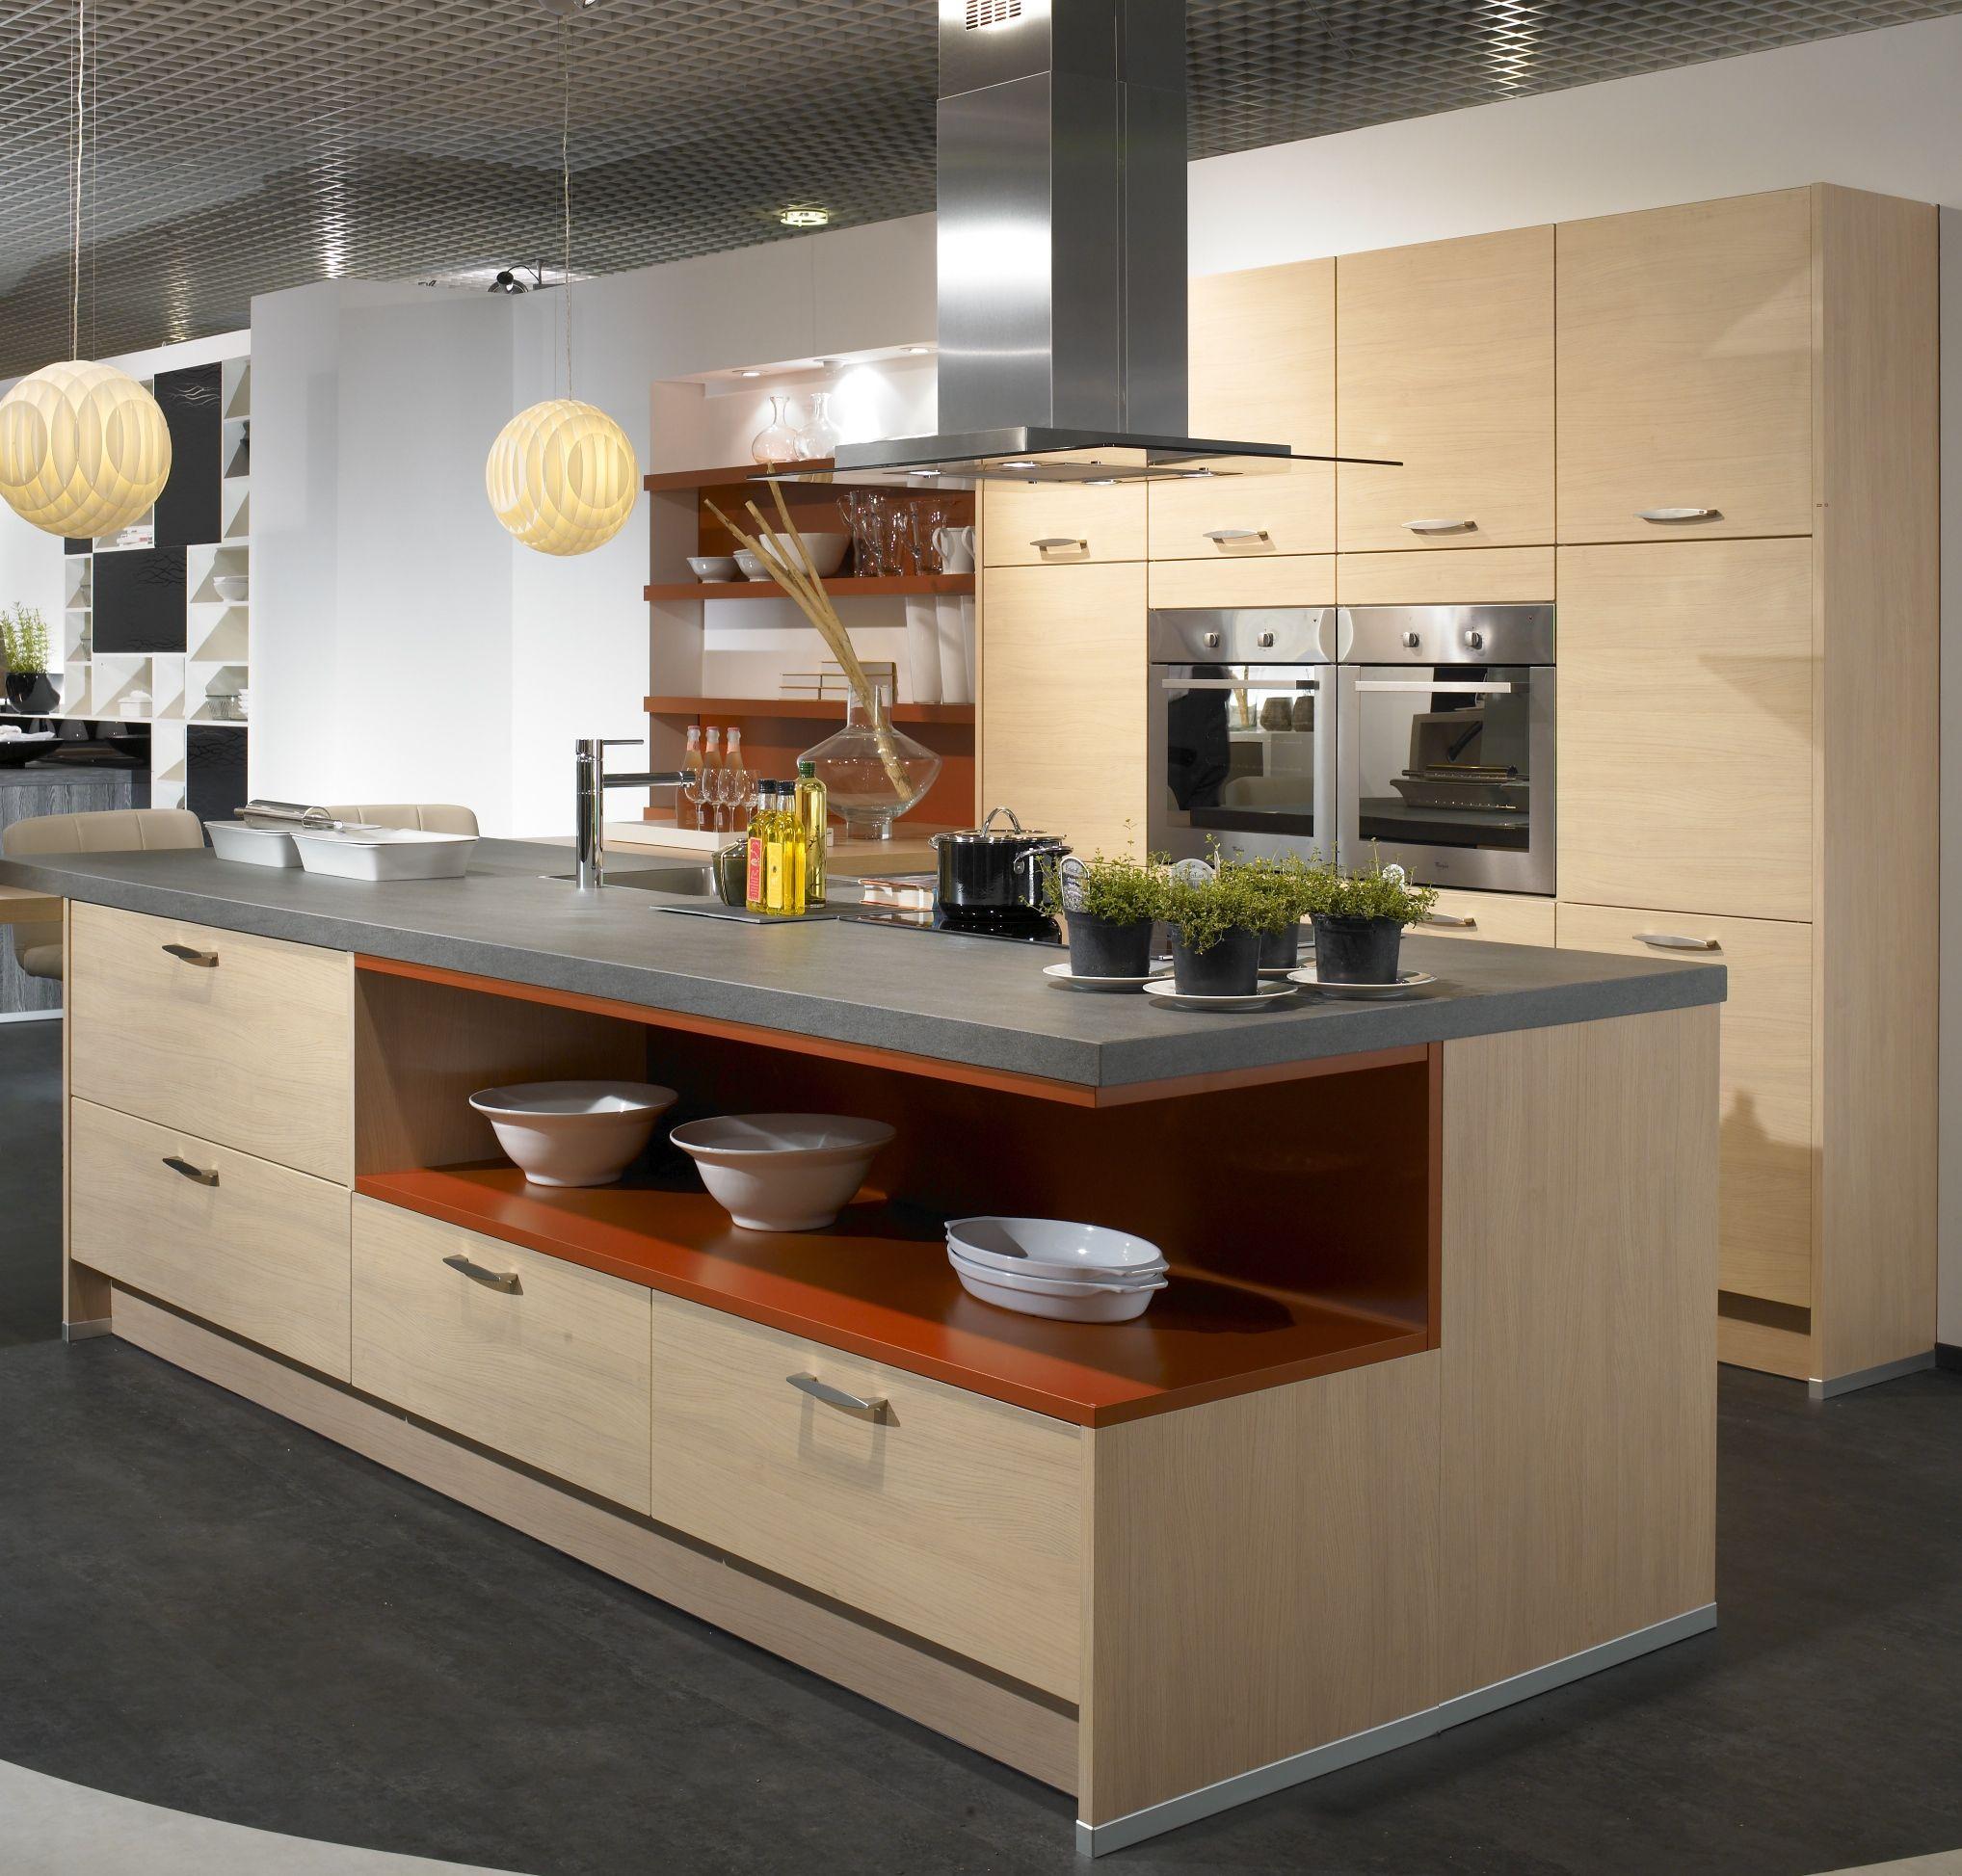 Cocina de inspiraci n eco de la serie wellmann de the singular kitchen cocinas reformas - The singular kitchen ...